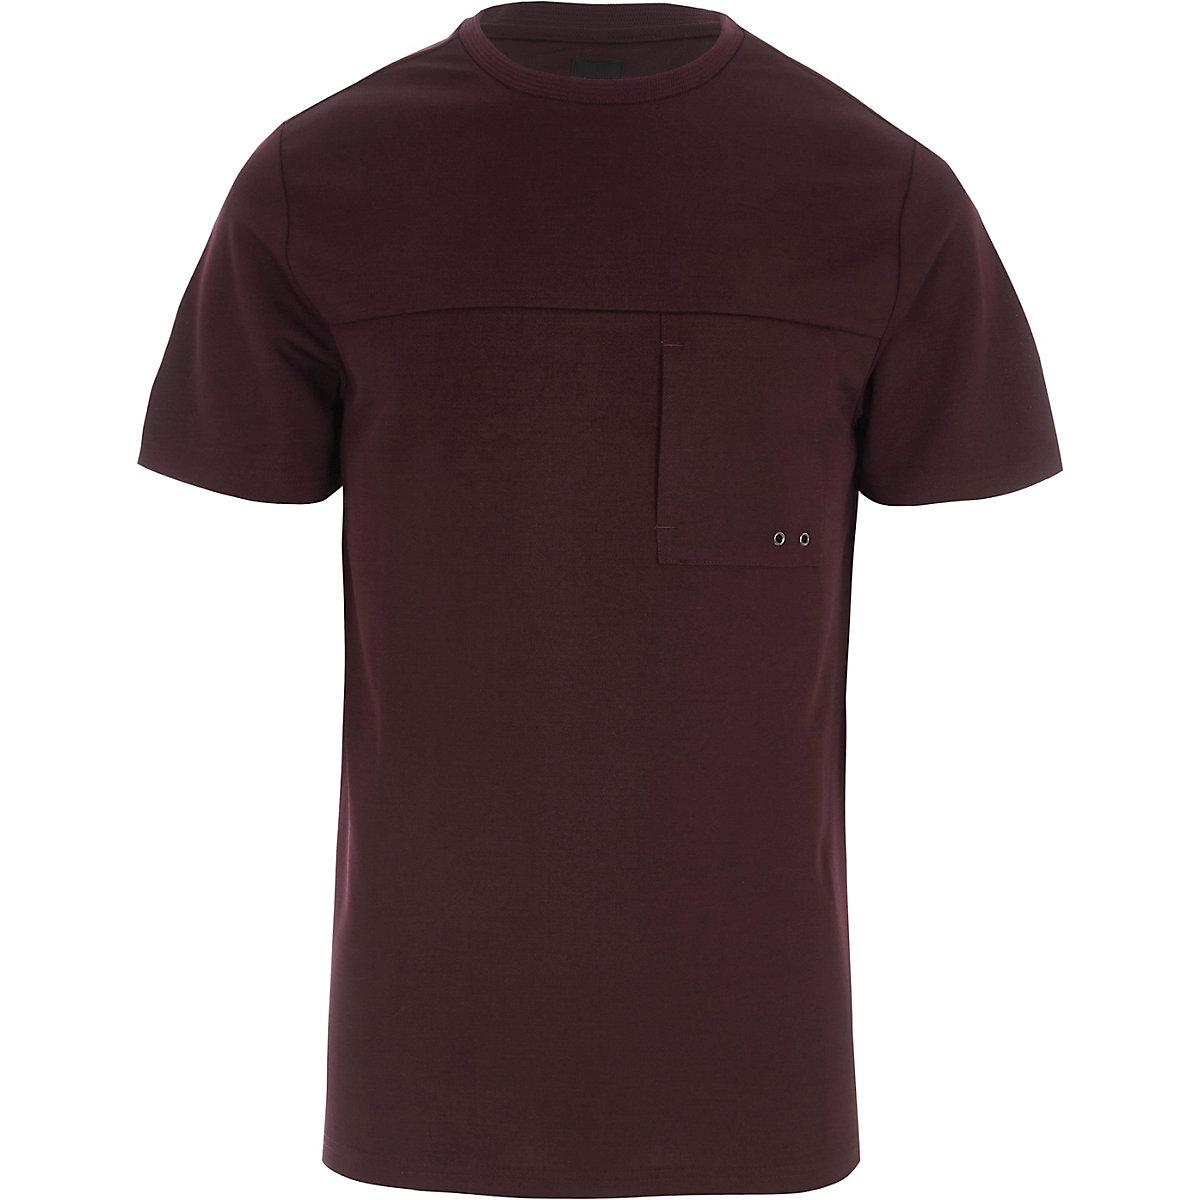 Burgundy slim fit pocket T-shirt